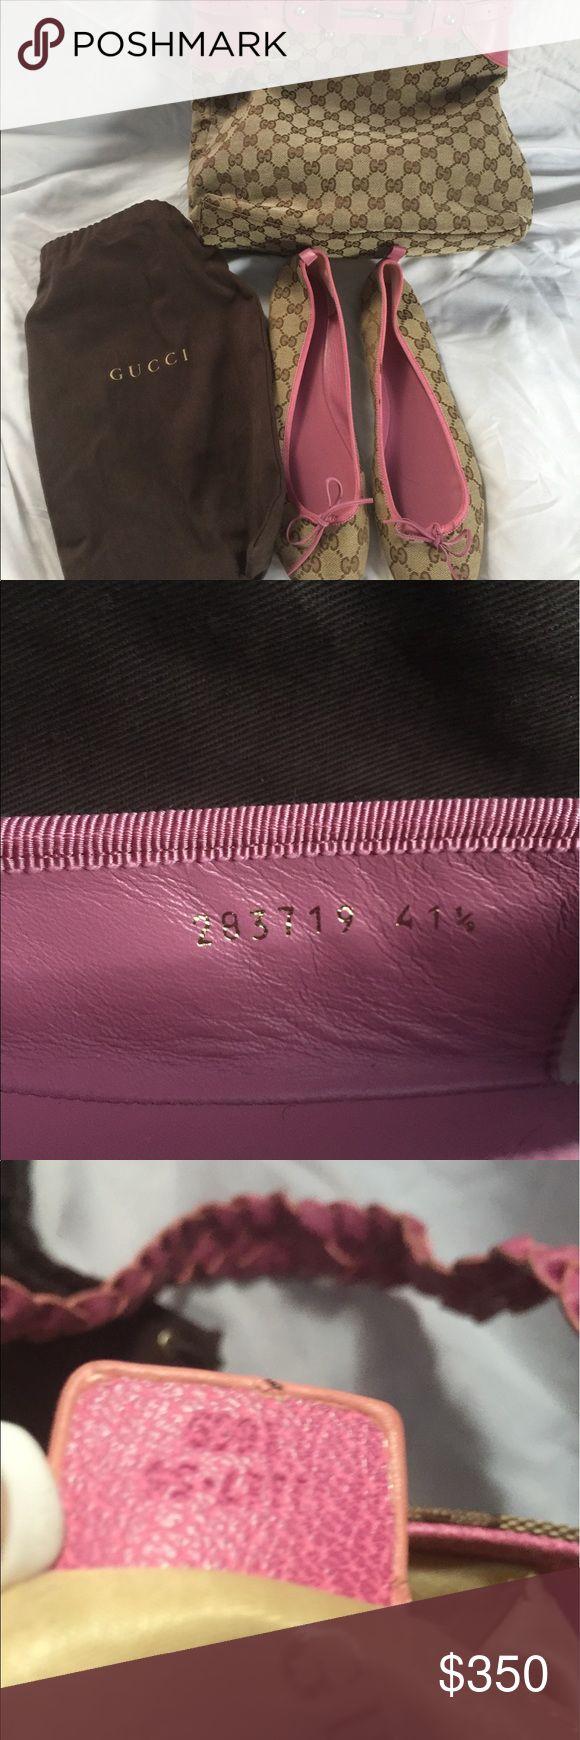 Authentic Gucci purse and shoe set Authentic Gucci Purse and shoes beigh. Pink trim Gucci Bags Totes